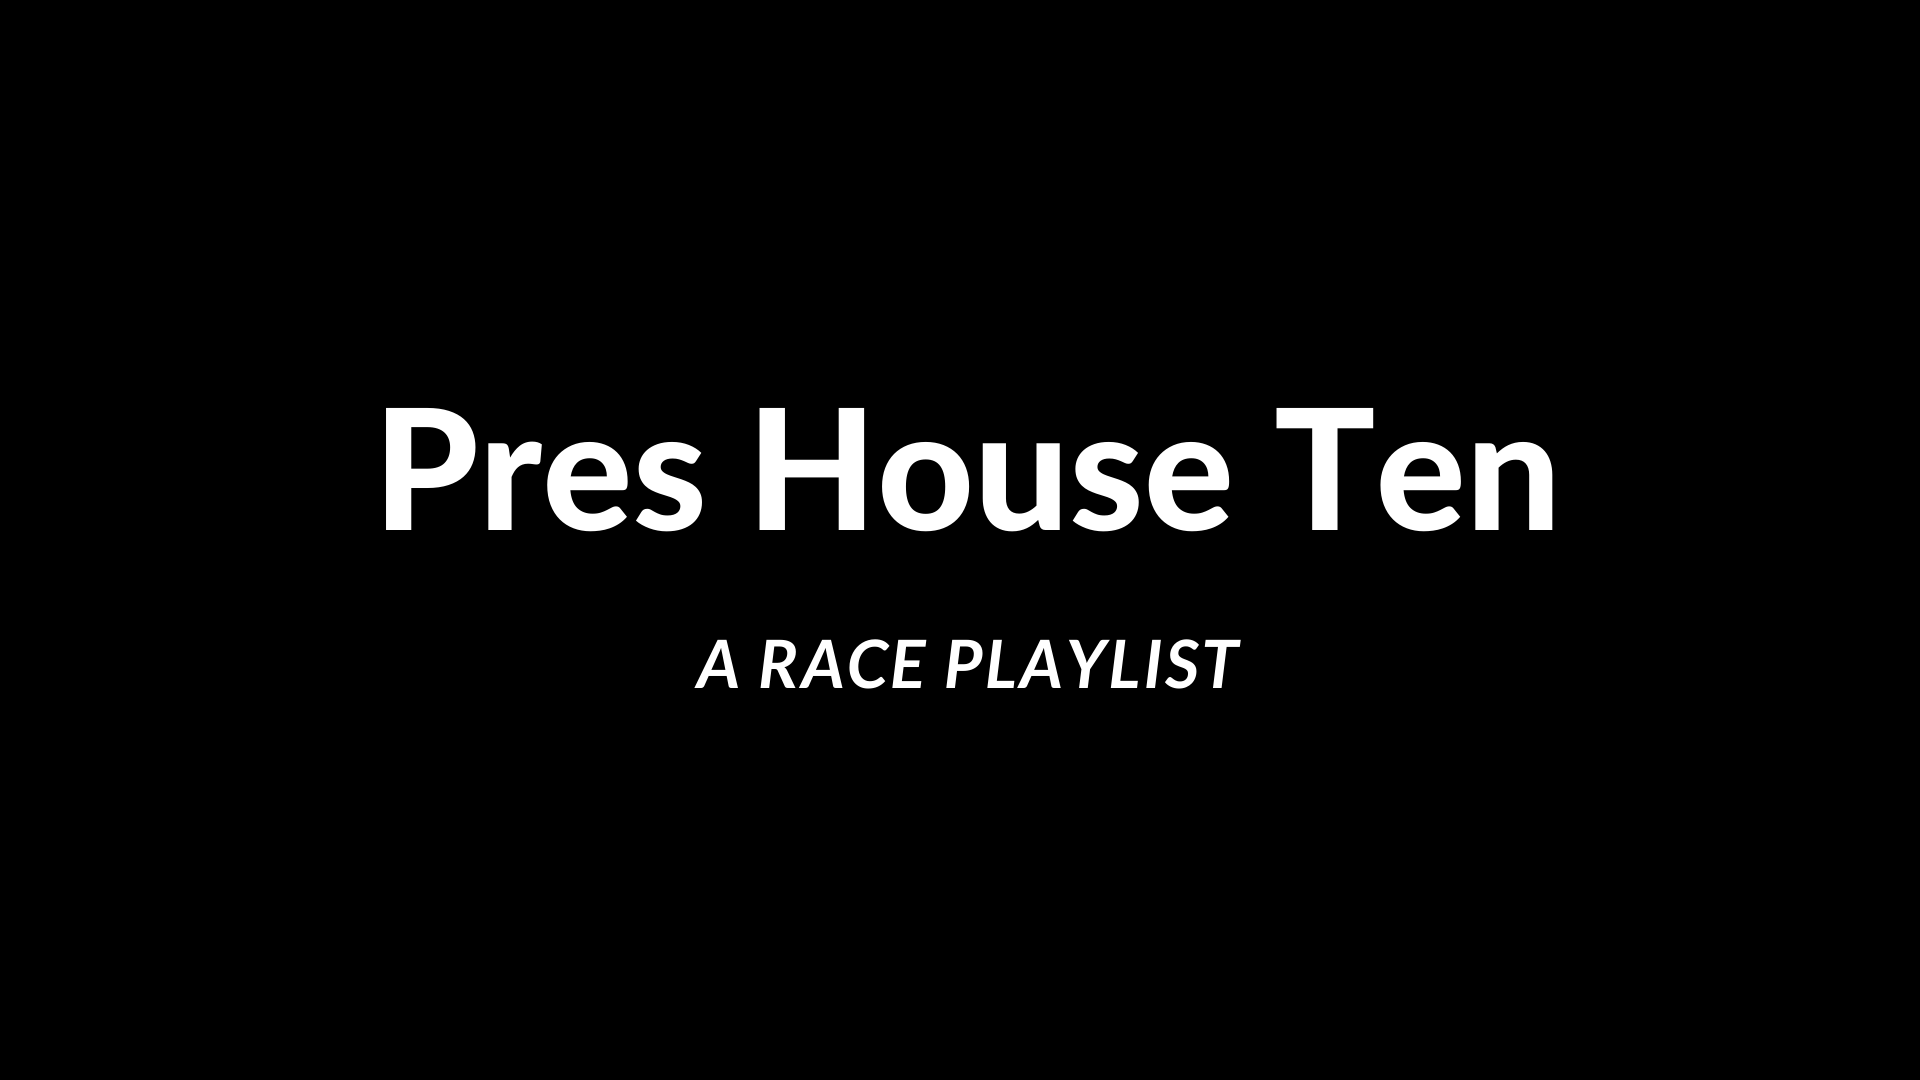 Pres House Ten – Race Playlist